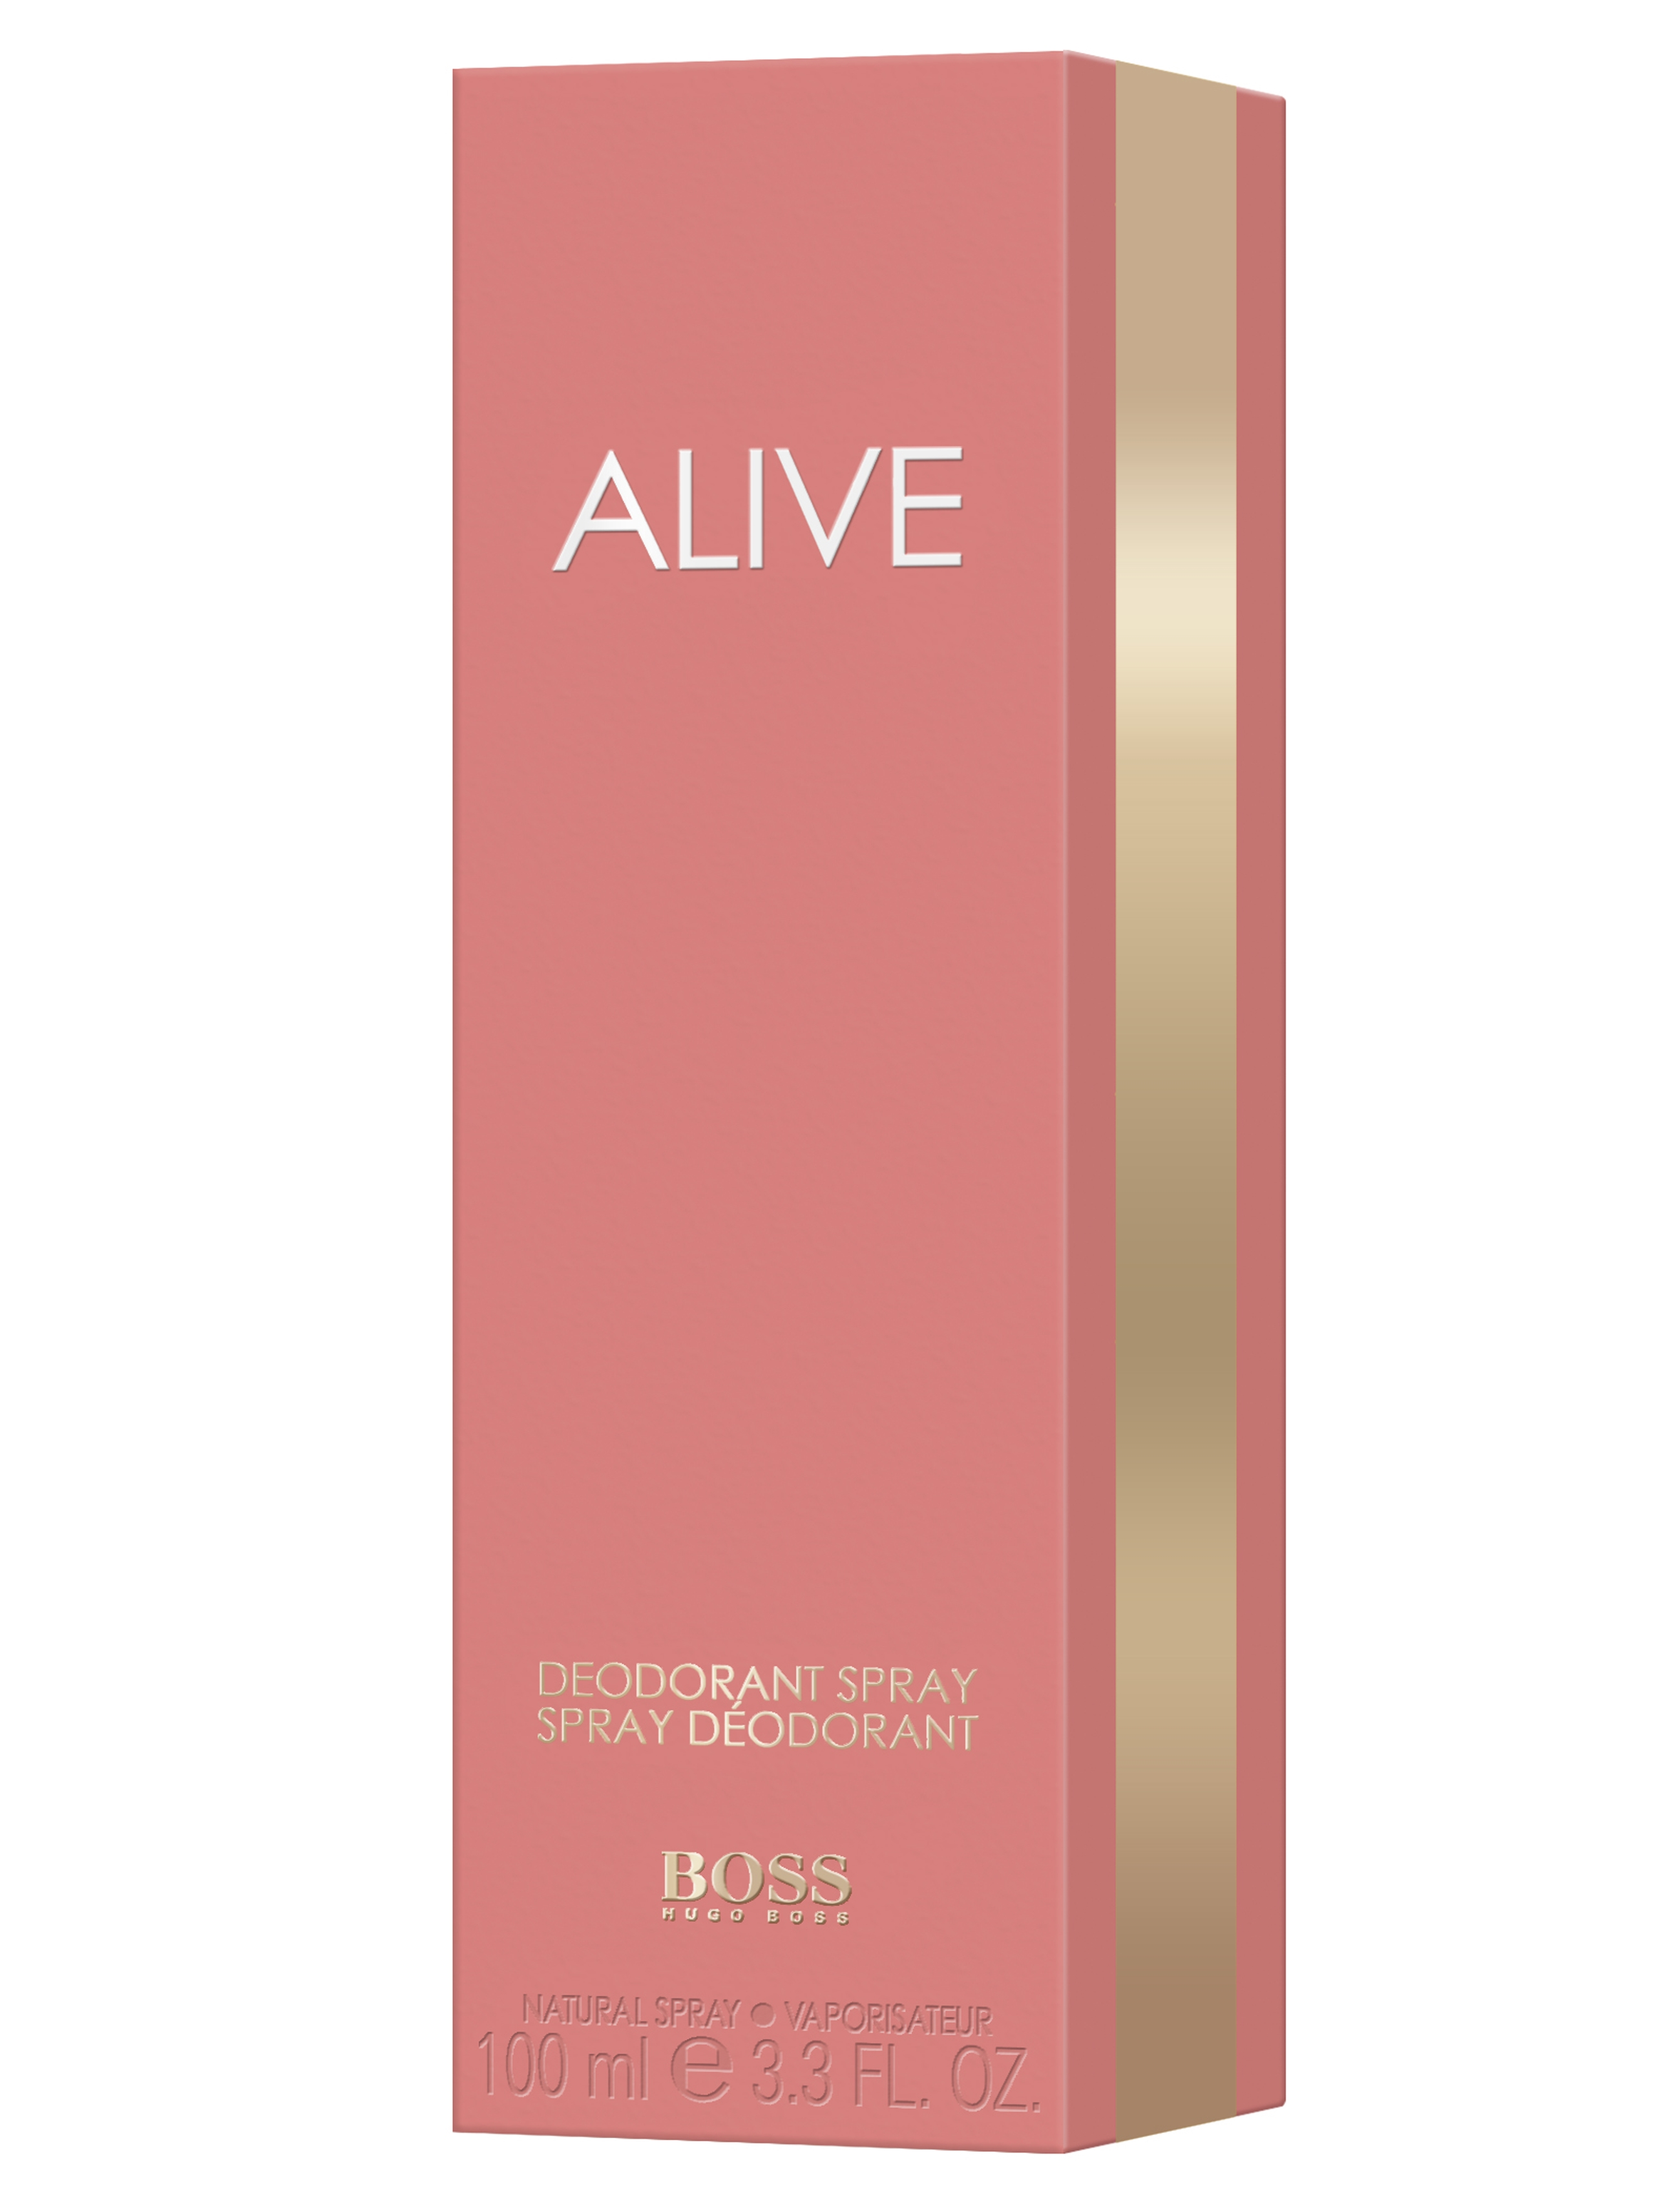 Hugo Boss Alive Her Deodorant Spray, 100 ml